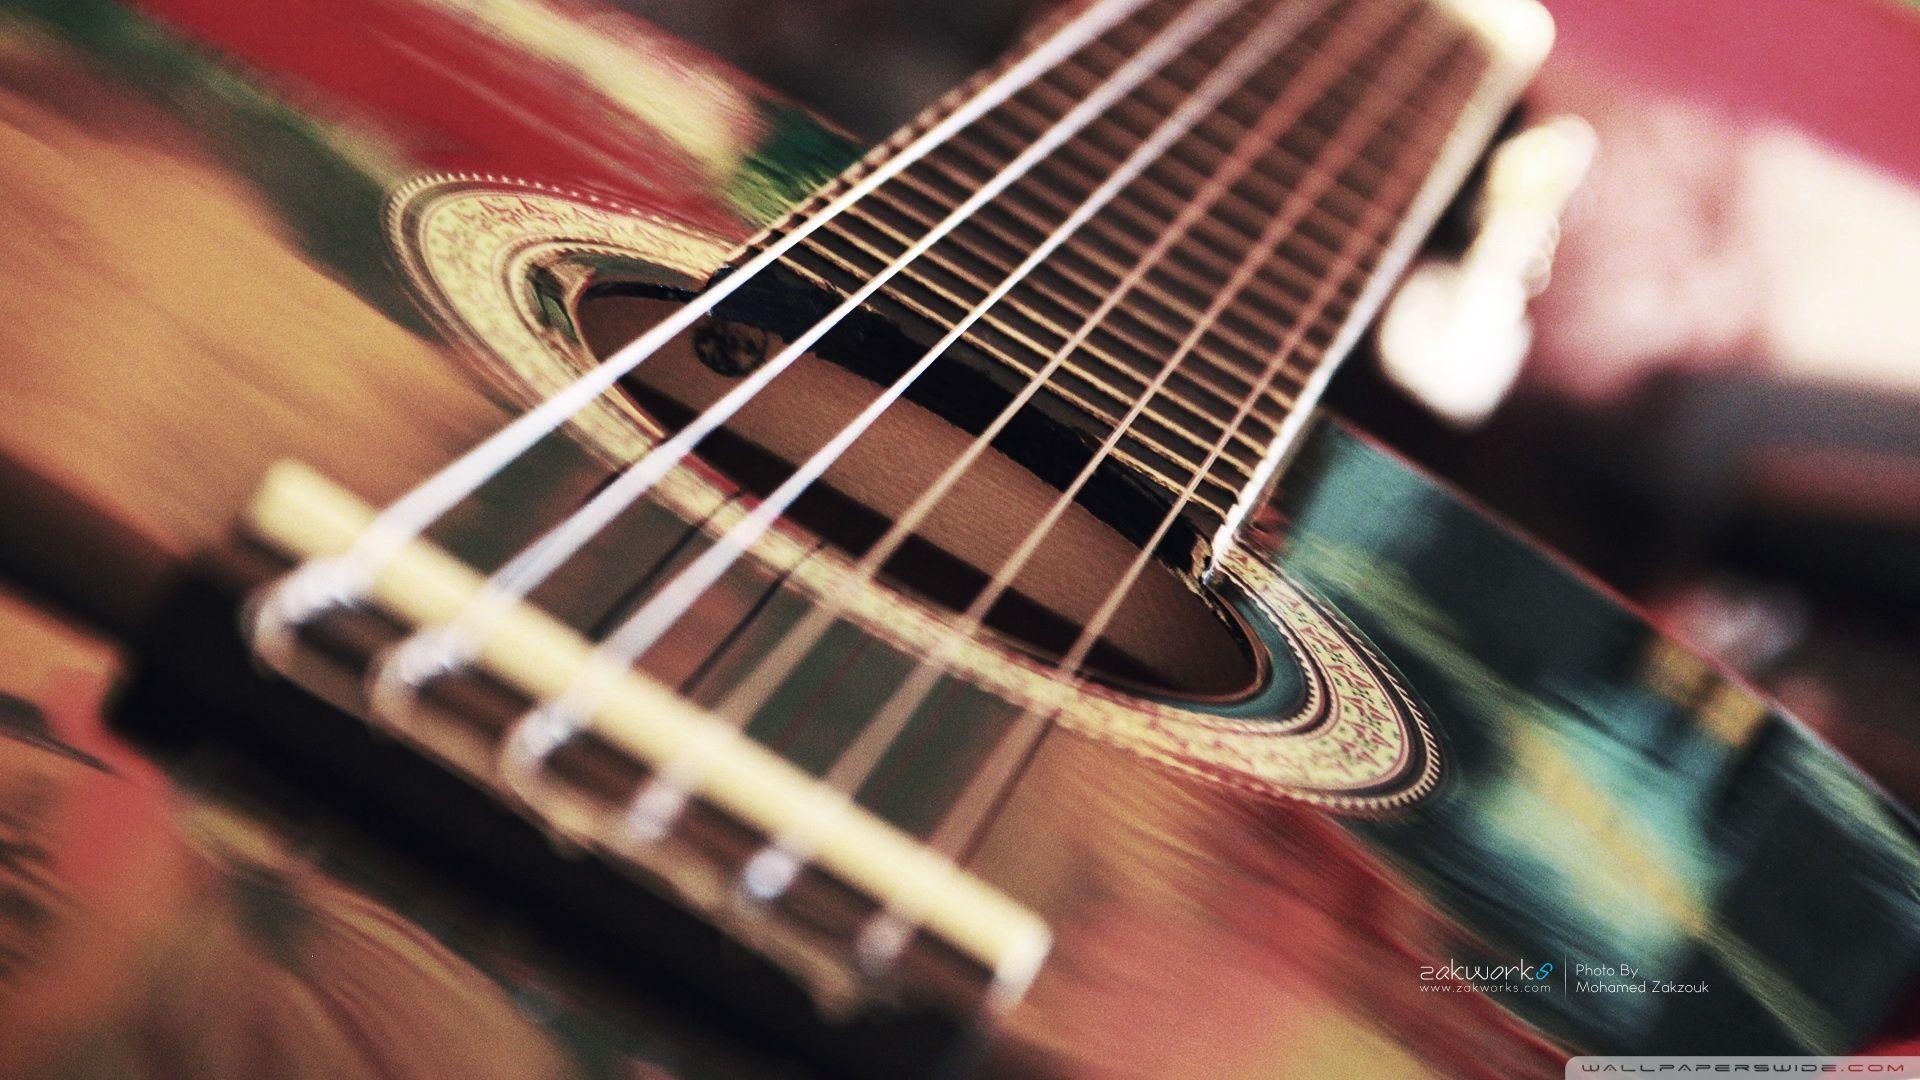 Acoustic Guitar HD desktop wallpaper Widescreen High